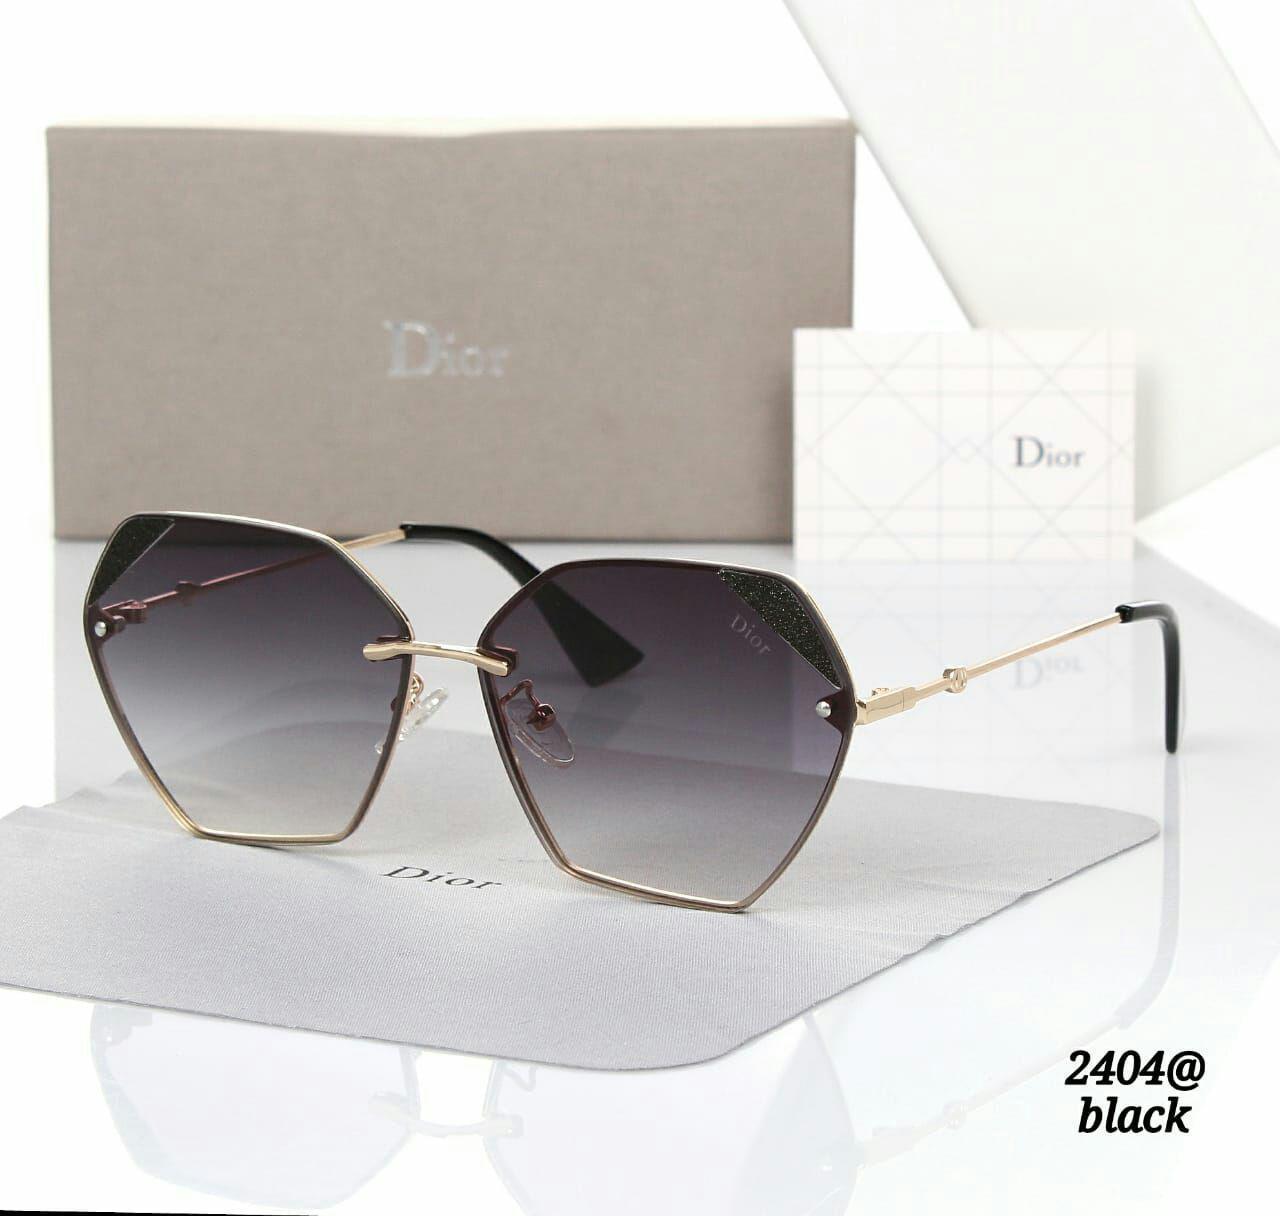 Kacamata Sunglasses Wanita - Women Sunglasses DIOR 2404  aa4dad58c5